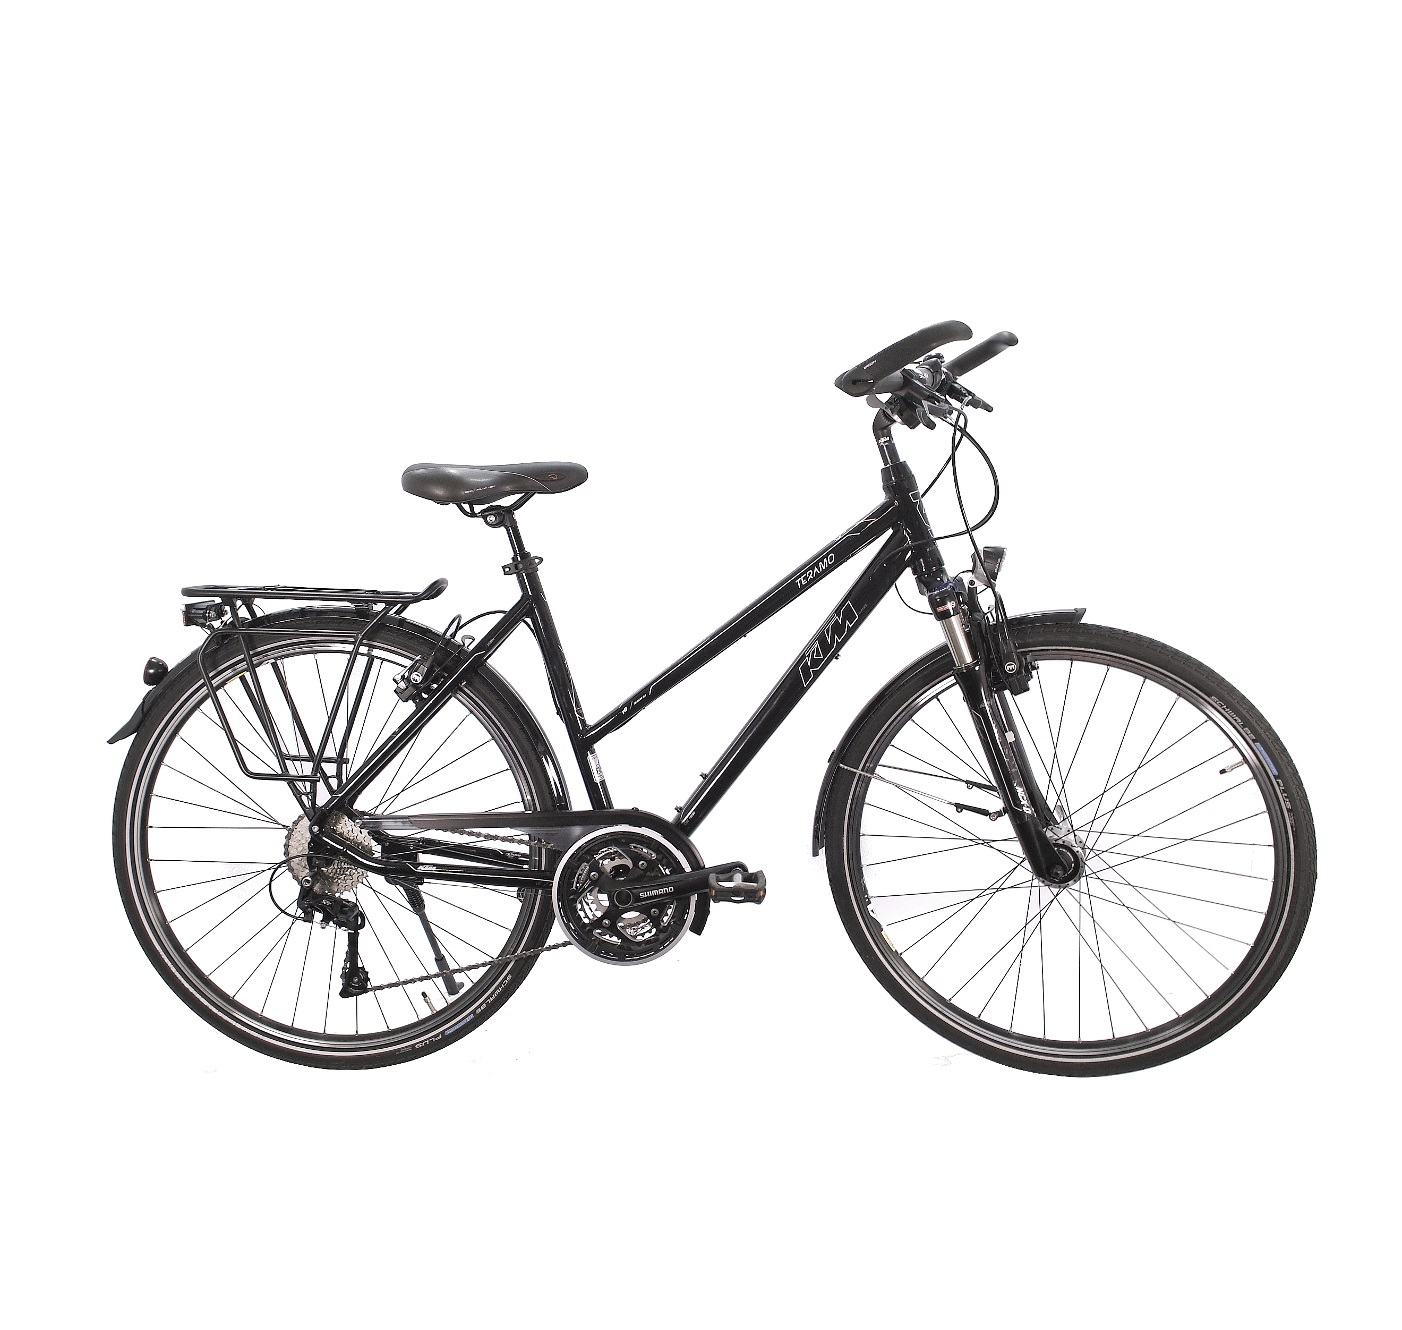 damen trekking fahrrad ktm teramo 28 zoll bike shimano xt. Black Bedroom Furniture Sets. Home Design Ideas